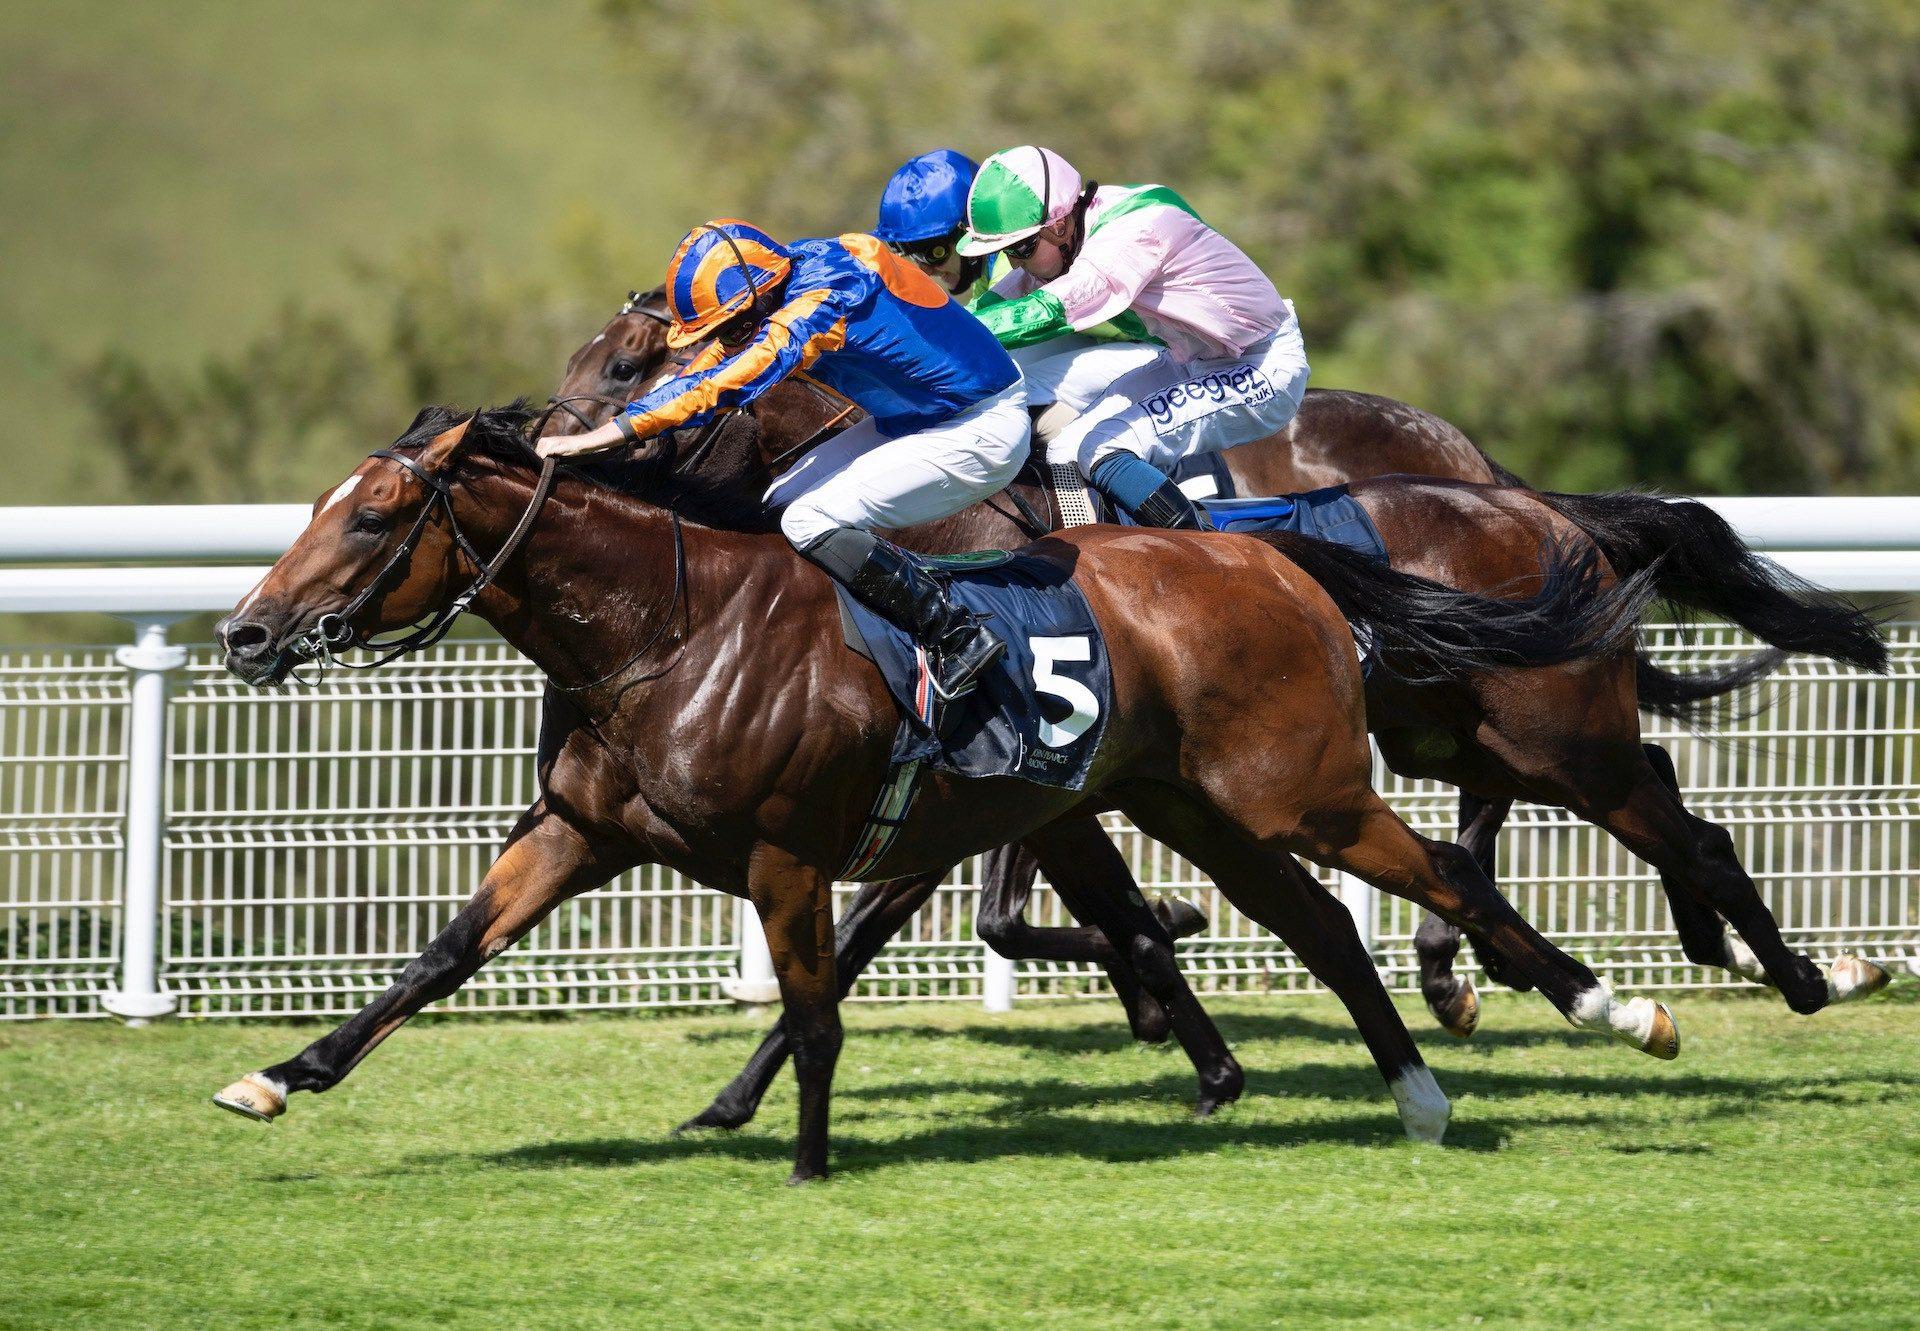 Joie De Soir (Fastnet Rock) Makes A Winning Debut At Deauville